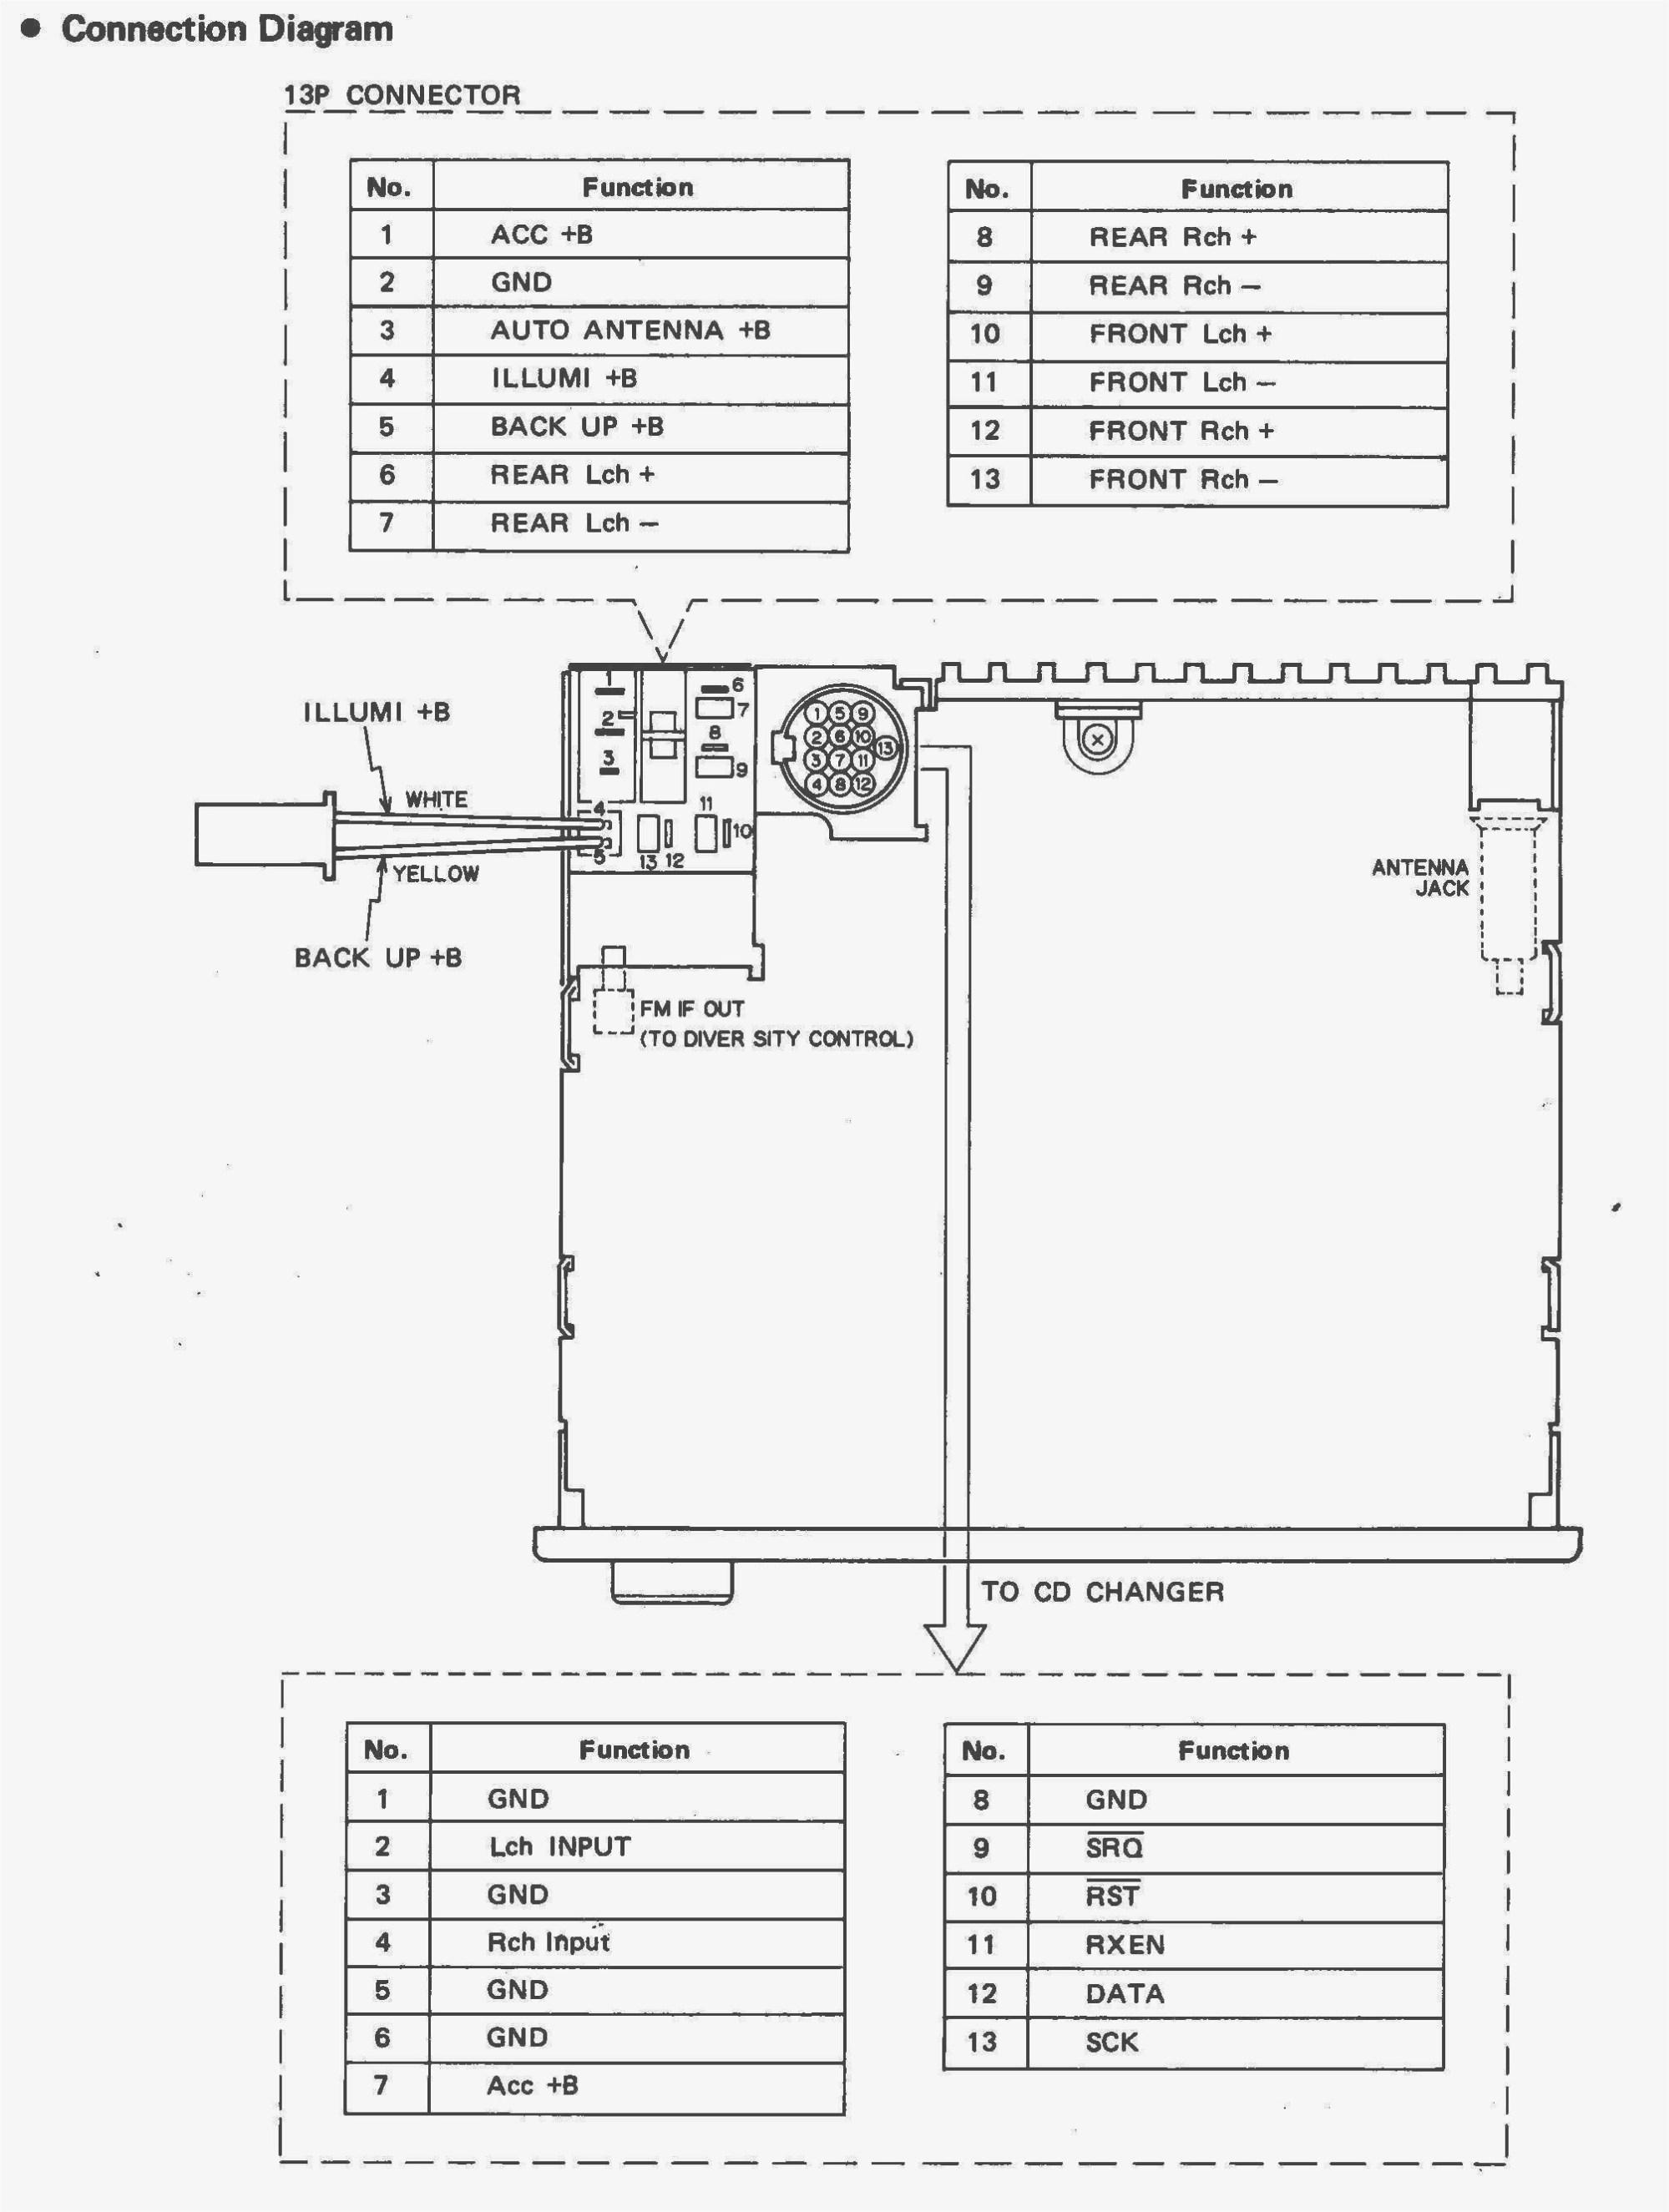 hight resolution of pioneer deh p8300ub wiring diagram wiring library rh 23 mac happen de pioneer deh x6500bt wiring diagram pioneer car stereo wiring diagram